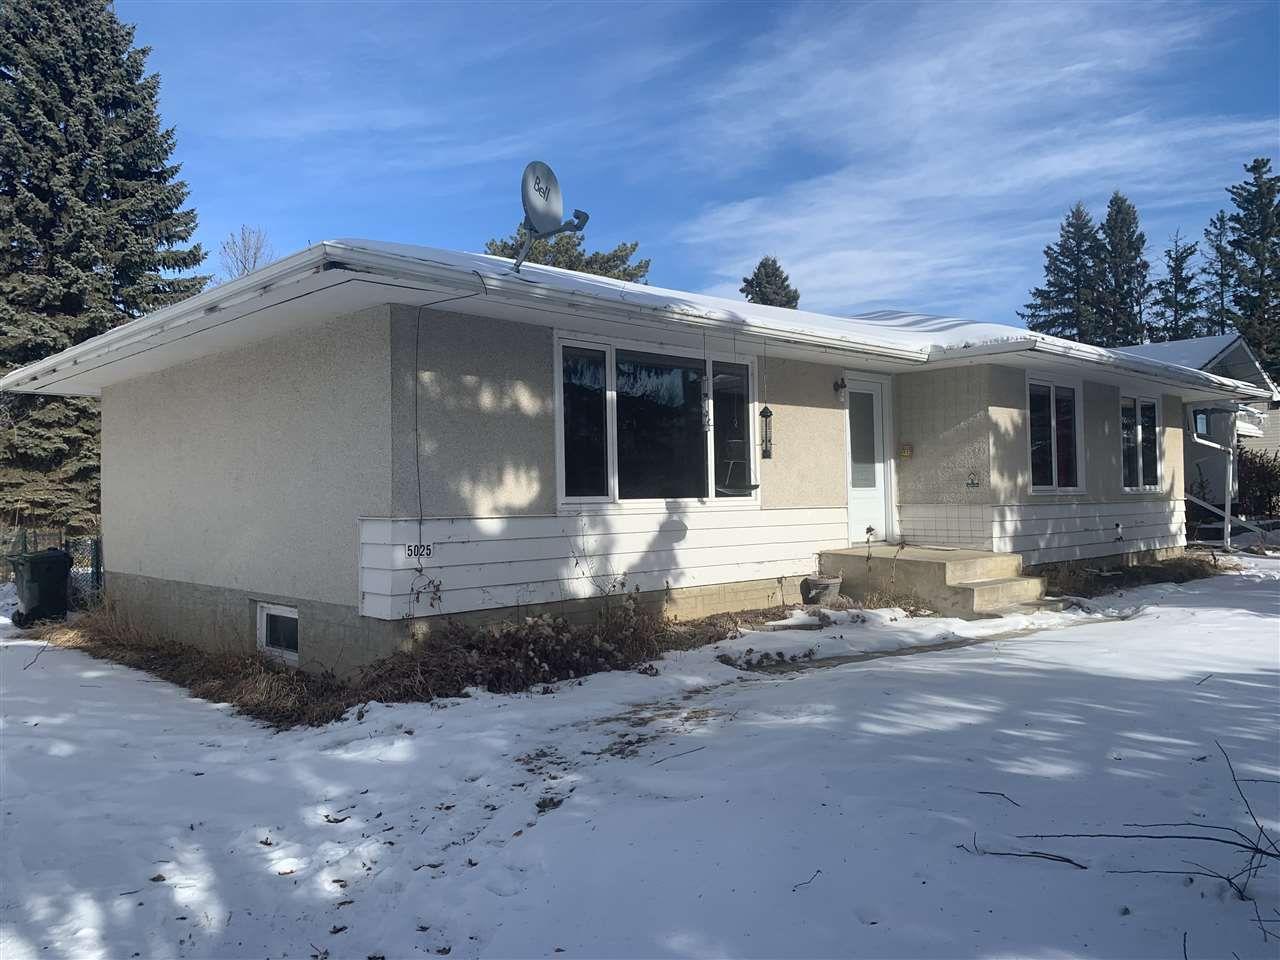 Main Photo: 5025-47 Ave: Stony Plain House for sale : MLS®# E4229643